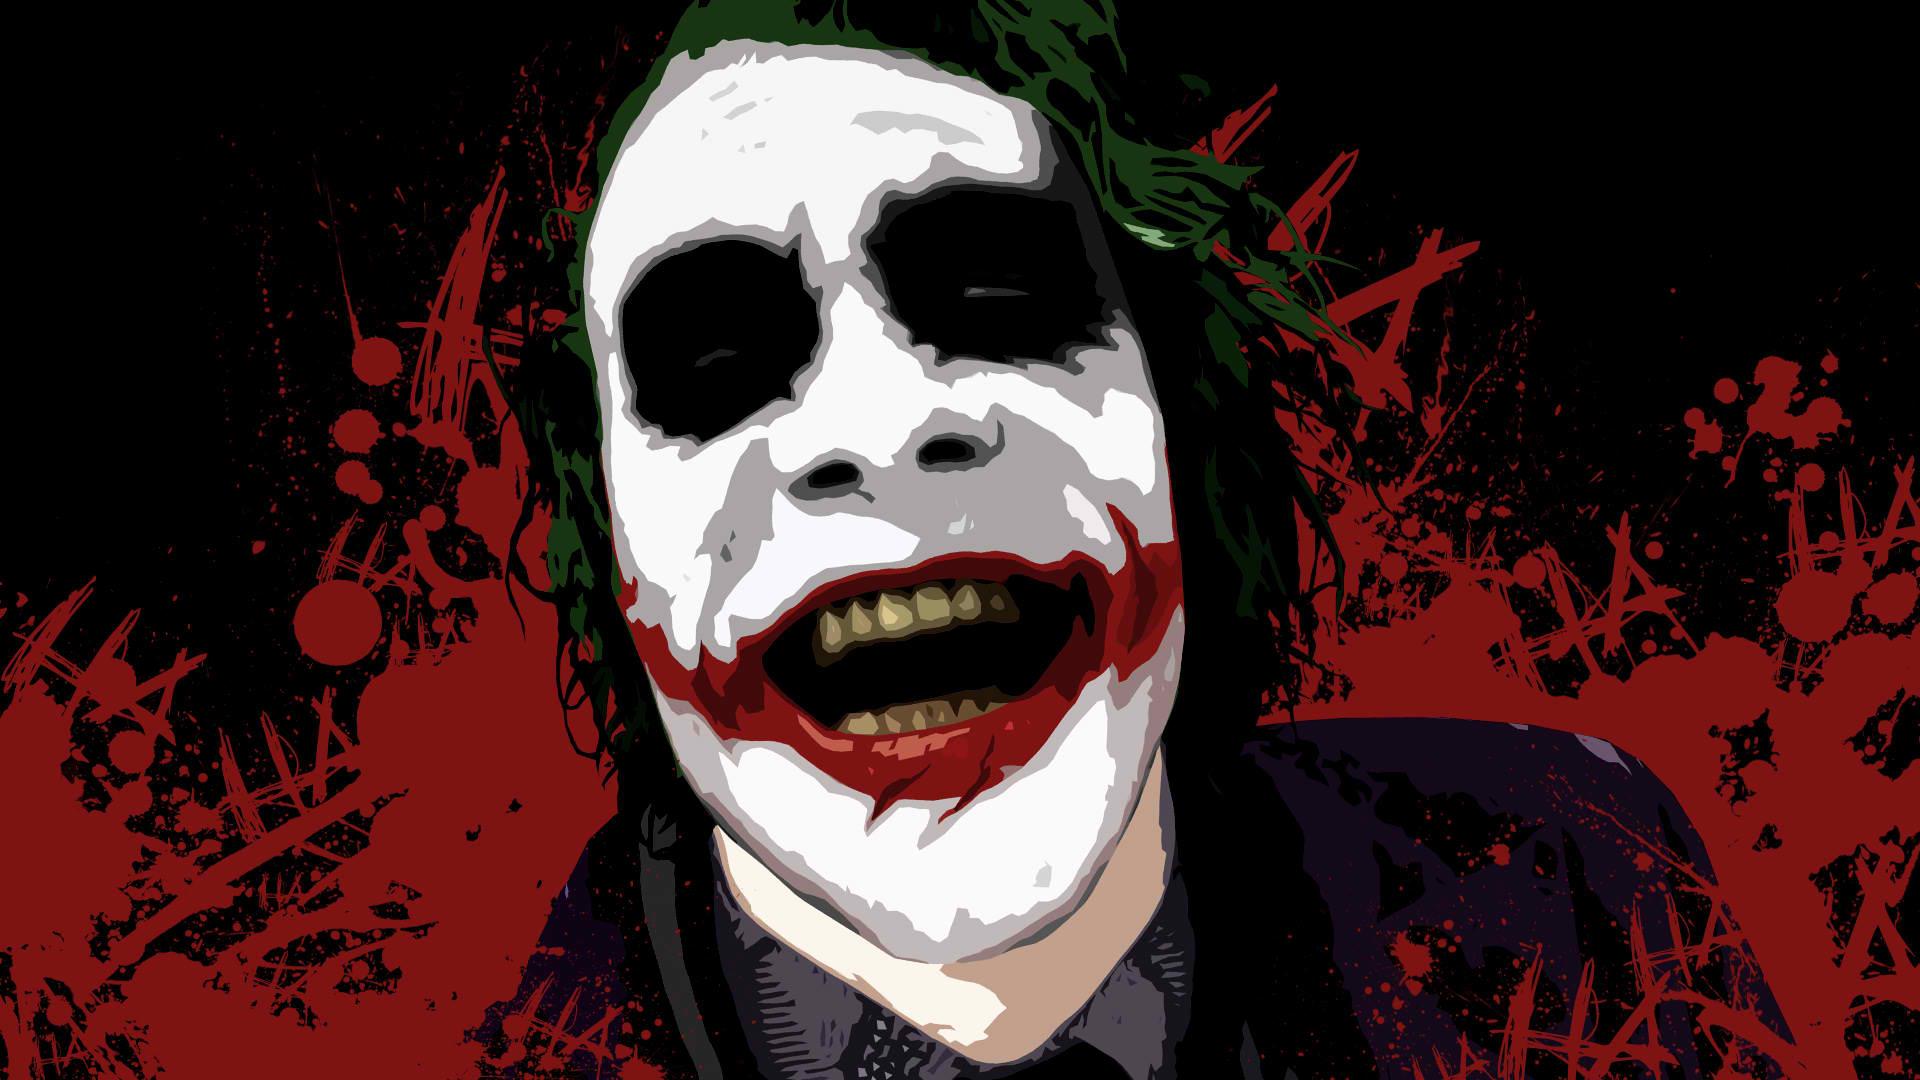 Heath Ledger Joker Wallpaper 1024x768 Images Pictures   Becuo 1920x1080